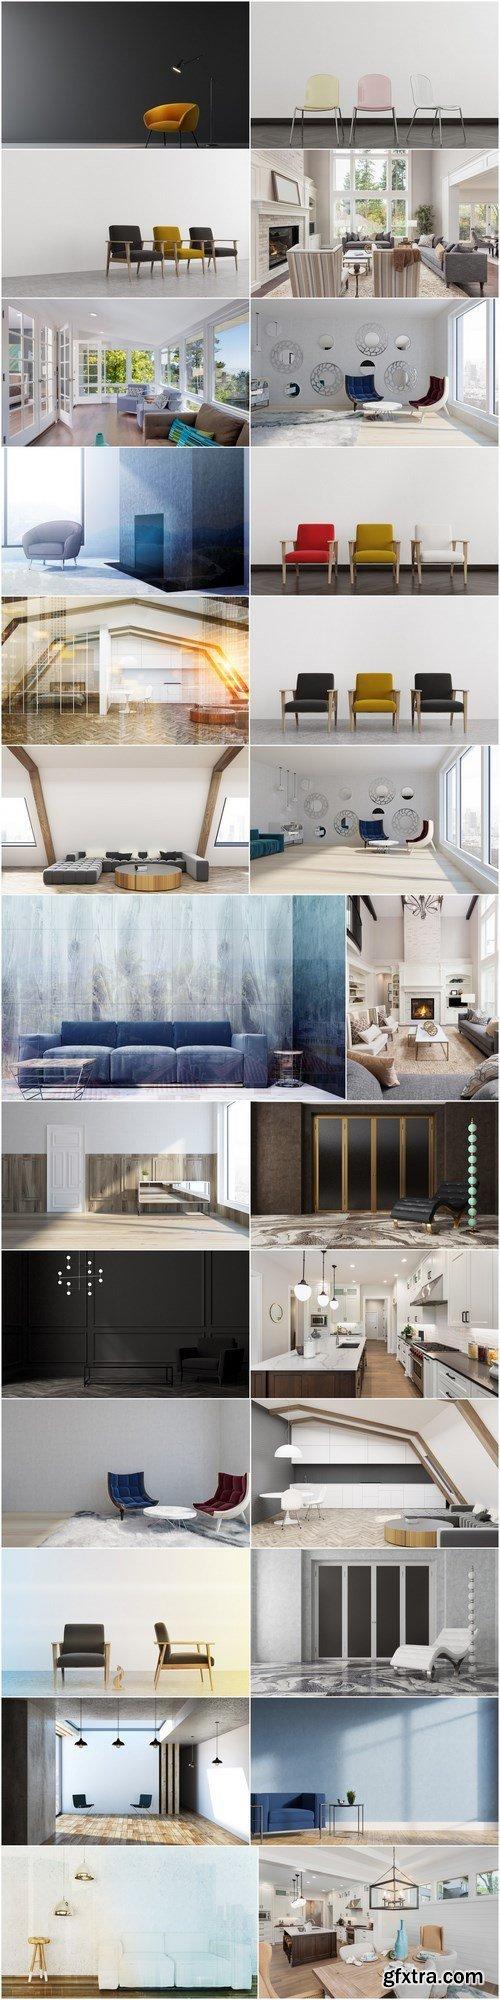 Modern interiors and cosiness - 26xHQ JPEG